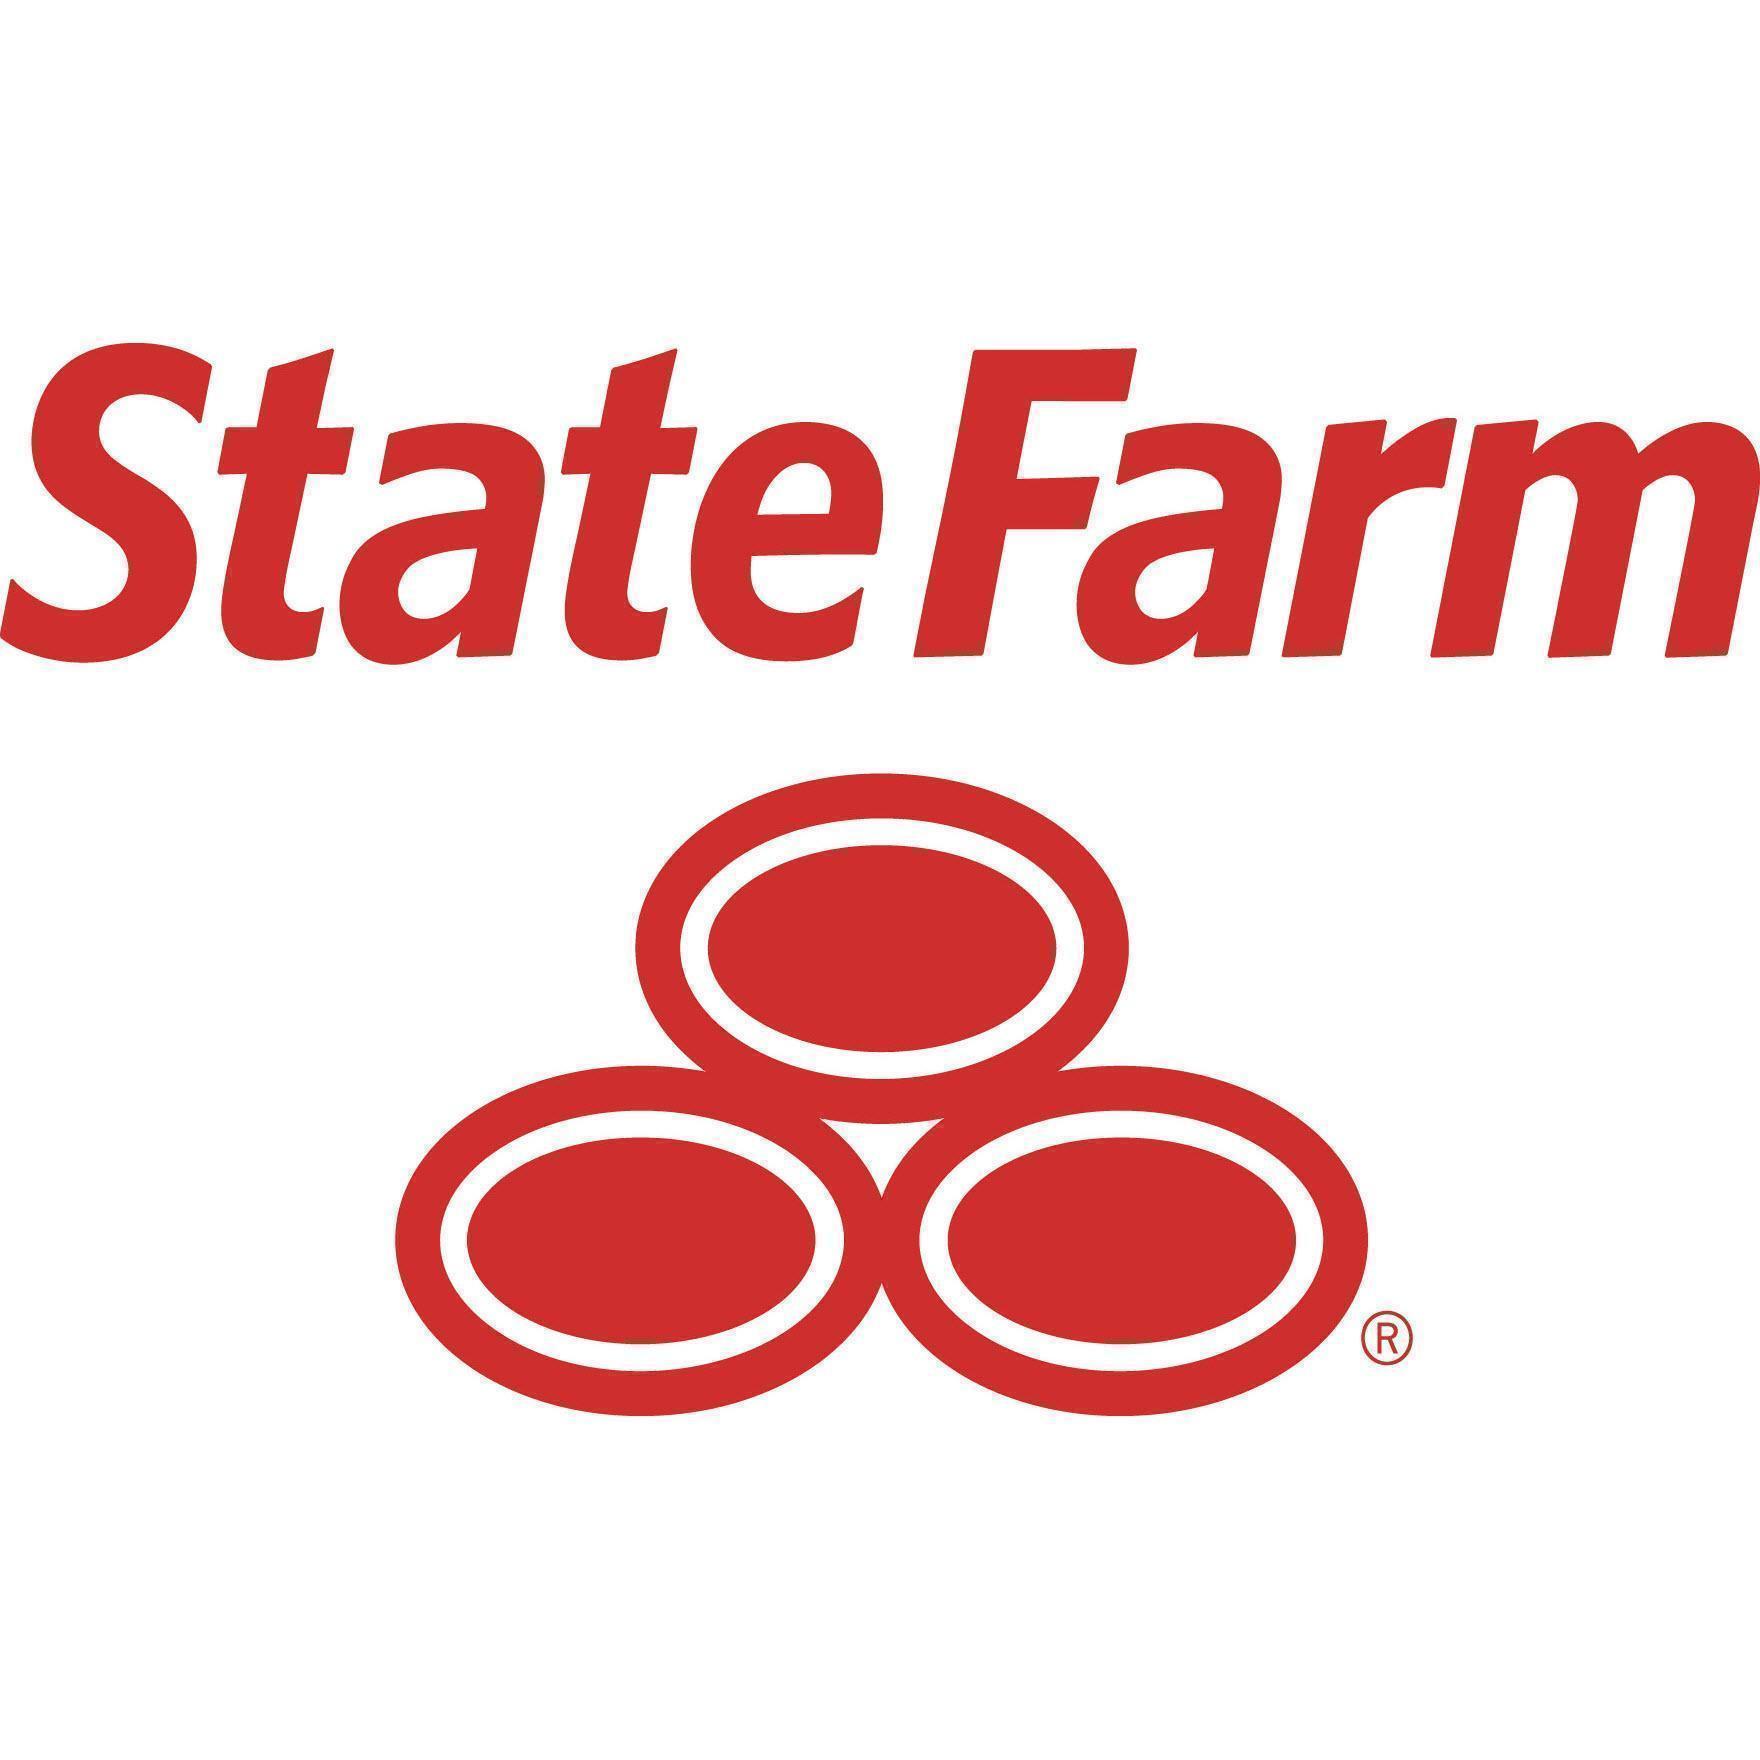 J. Blaine Somerville - State Farm Insurance Agent